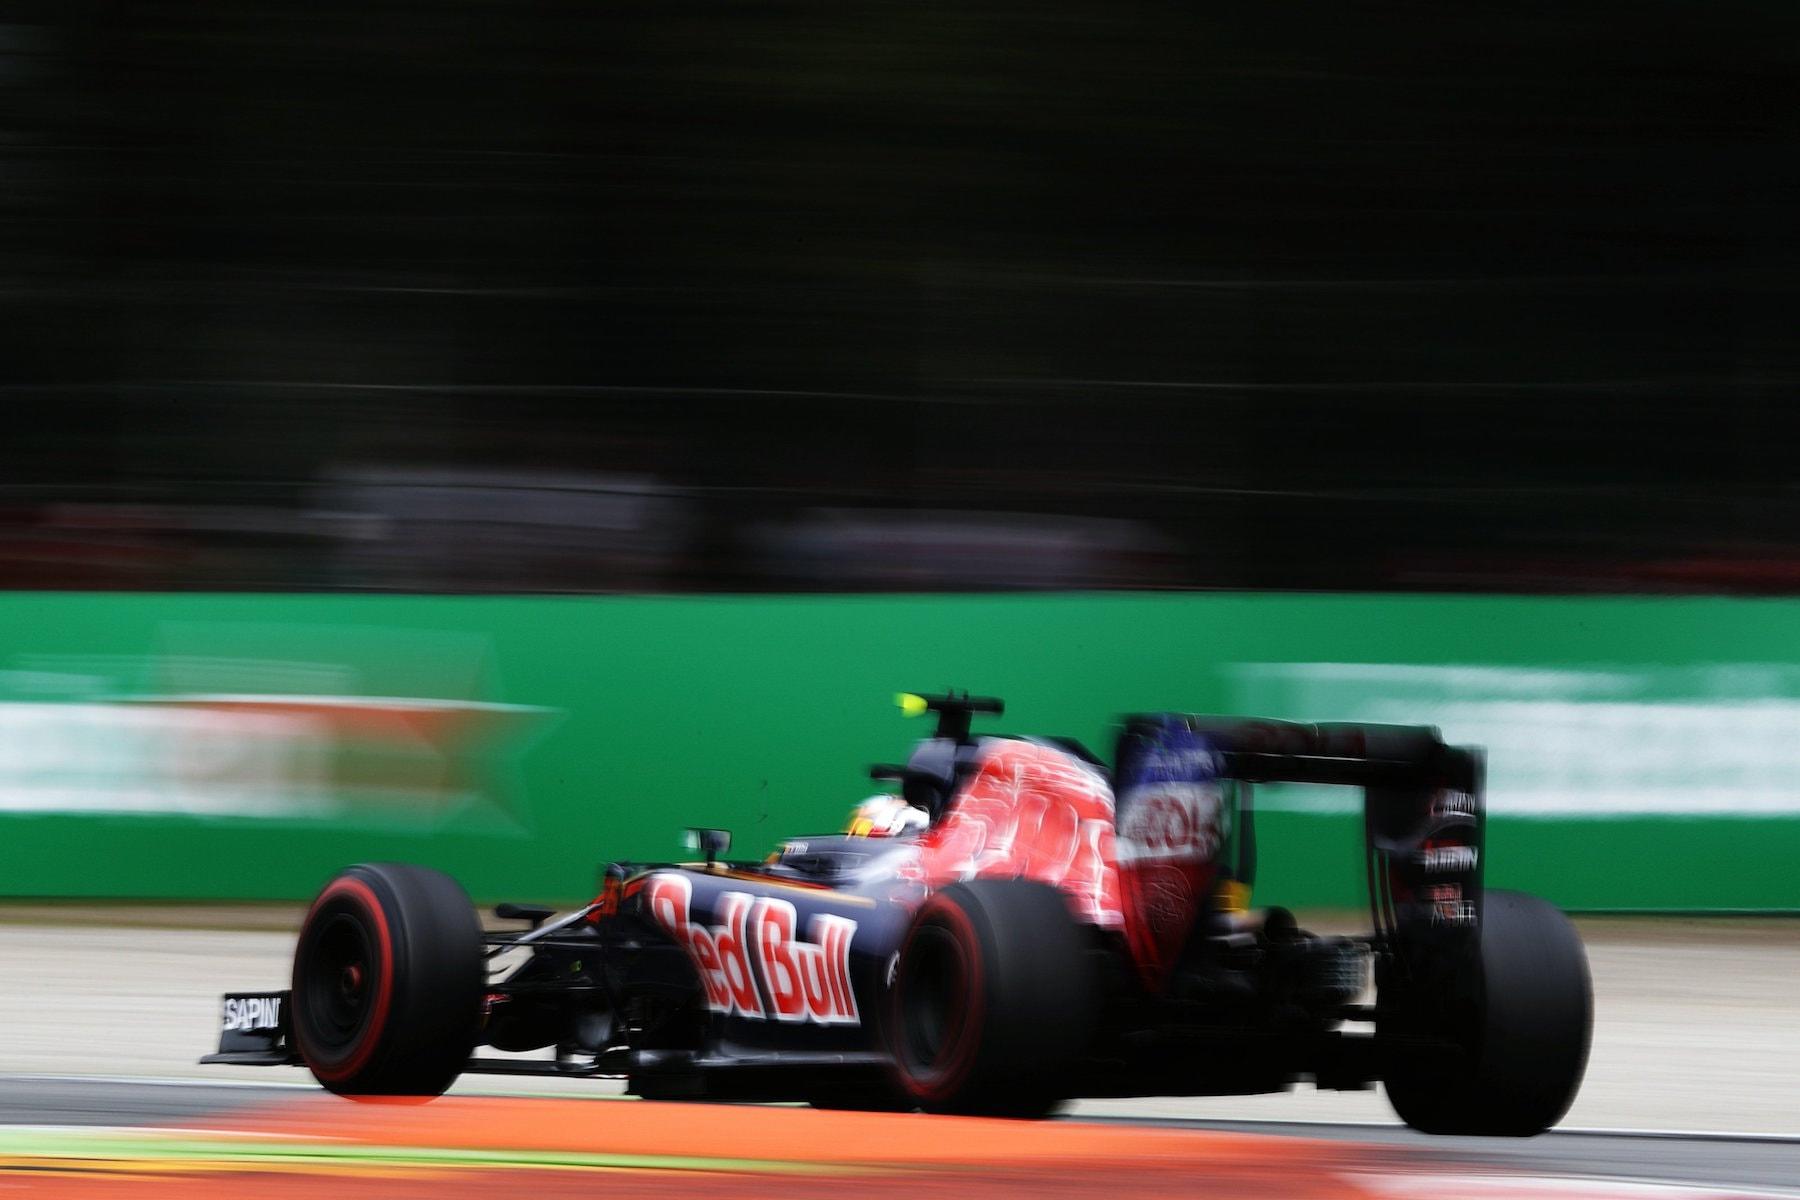 Salracing - Carlos Sainz | Scuderia Toro Rosso